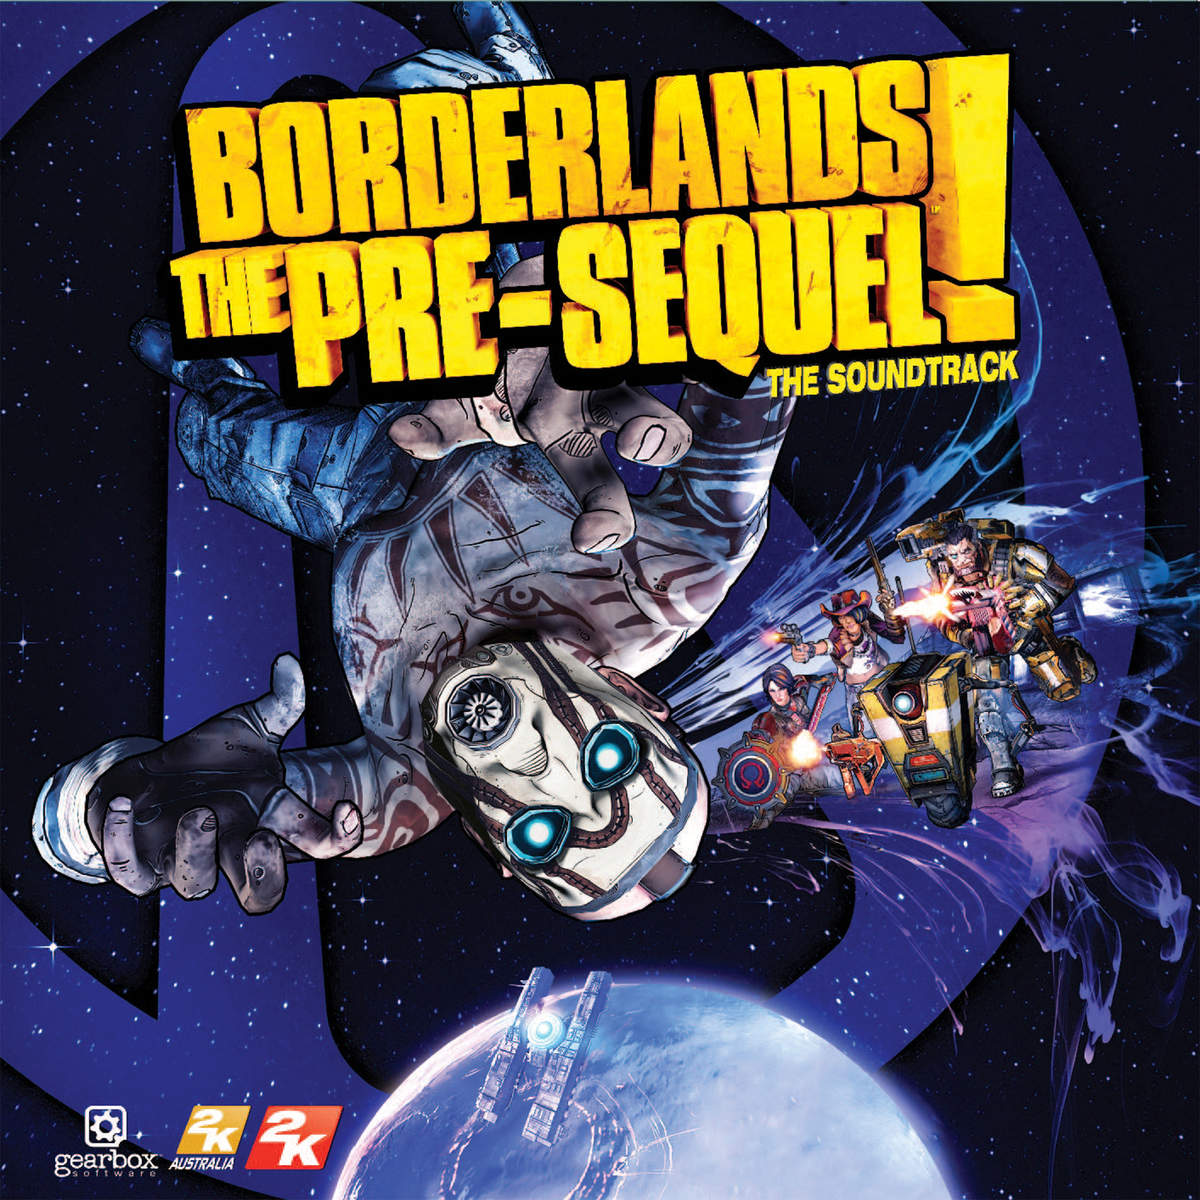 Borderlands_The_Pre-Sequel_The_Soundtrack__cover1200x1200.jpeg